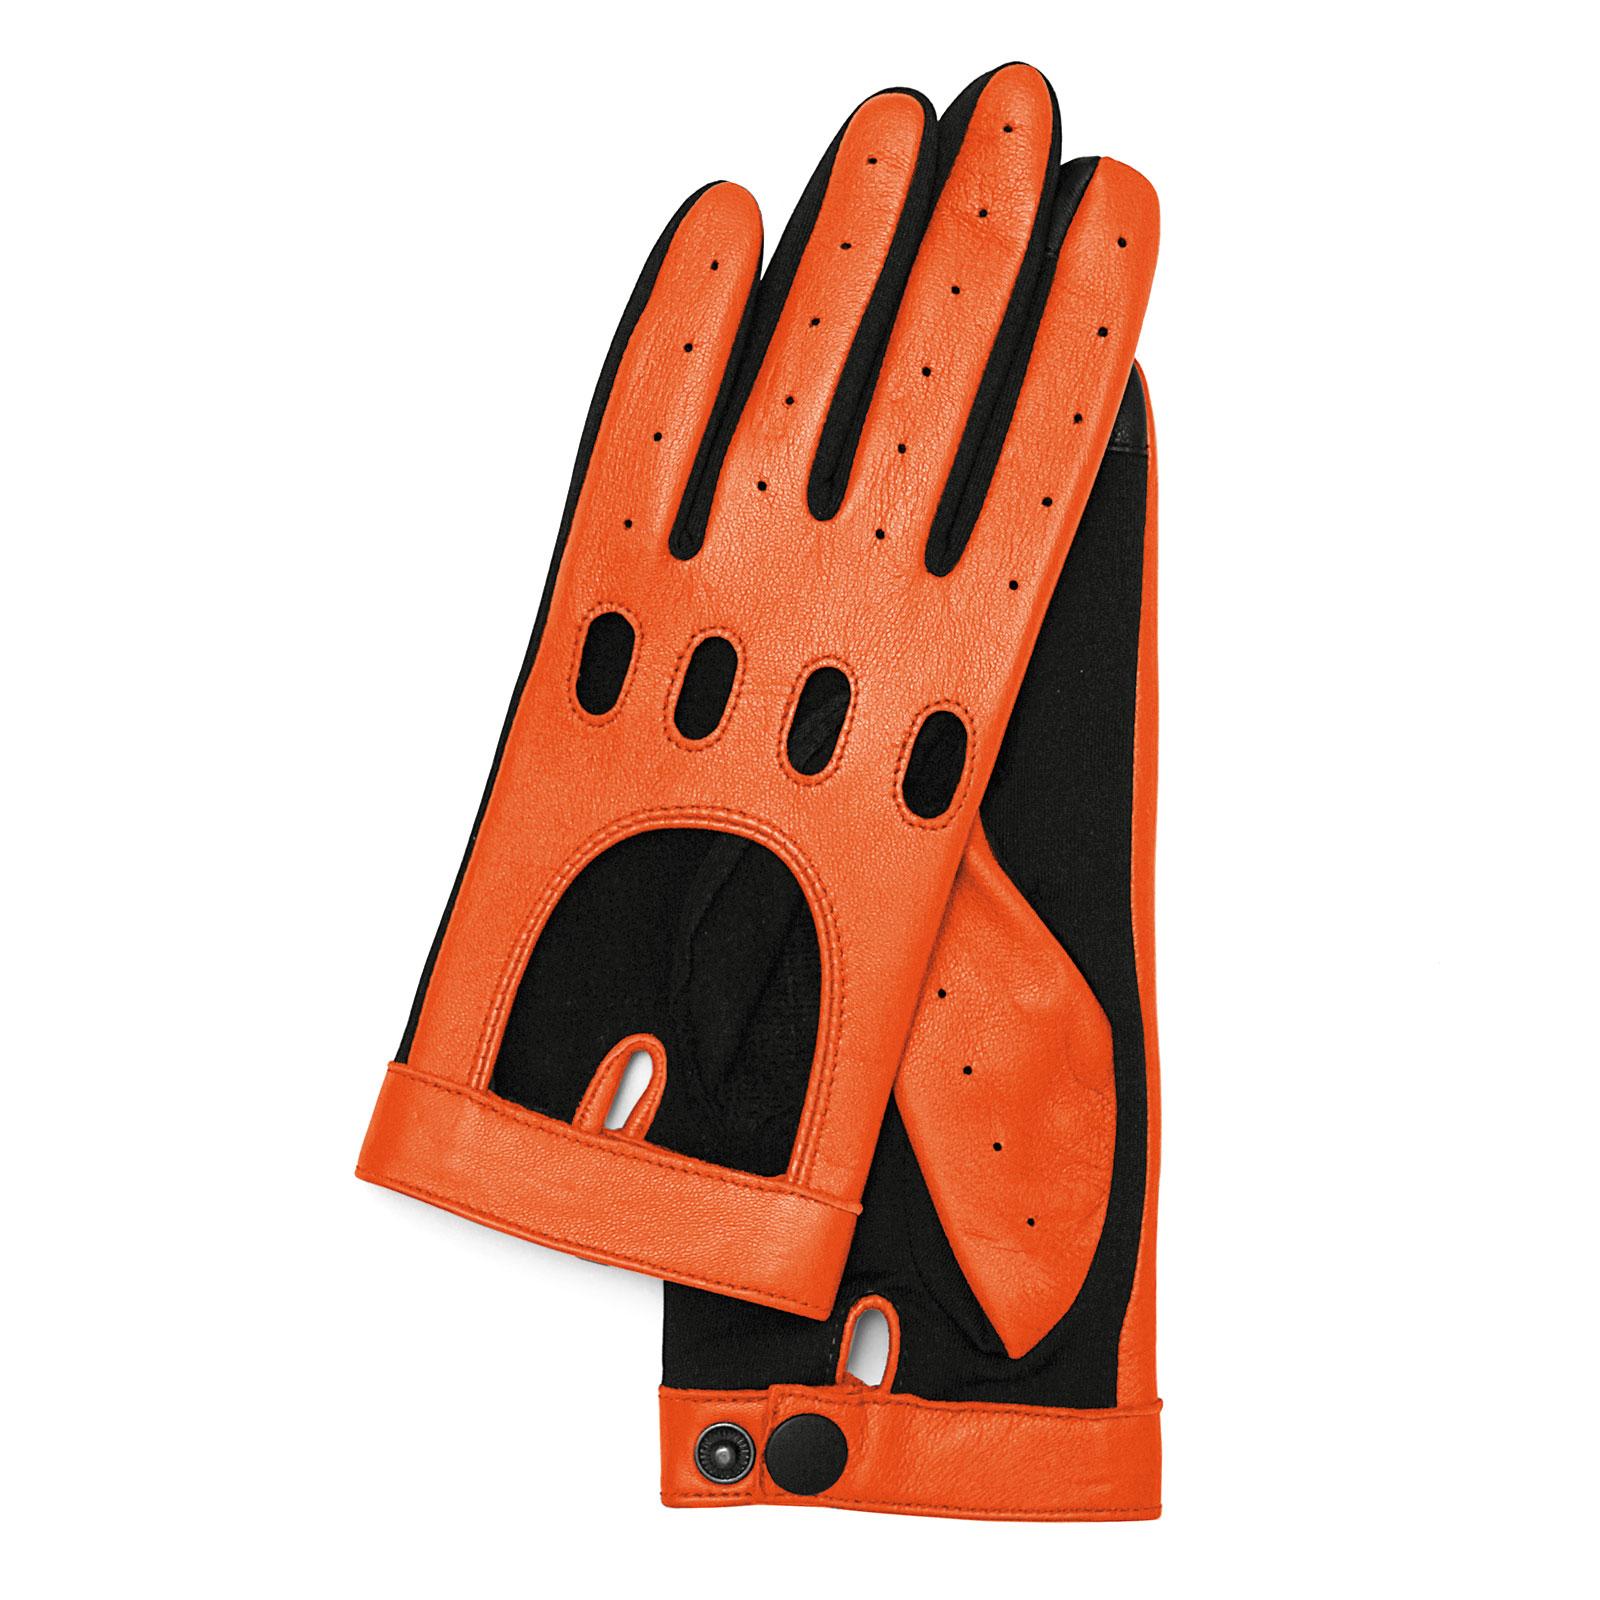 Mia Driver's Glove vermillion orange 452